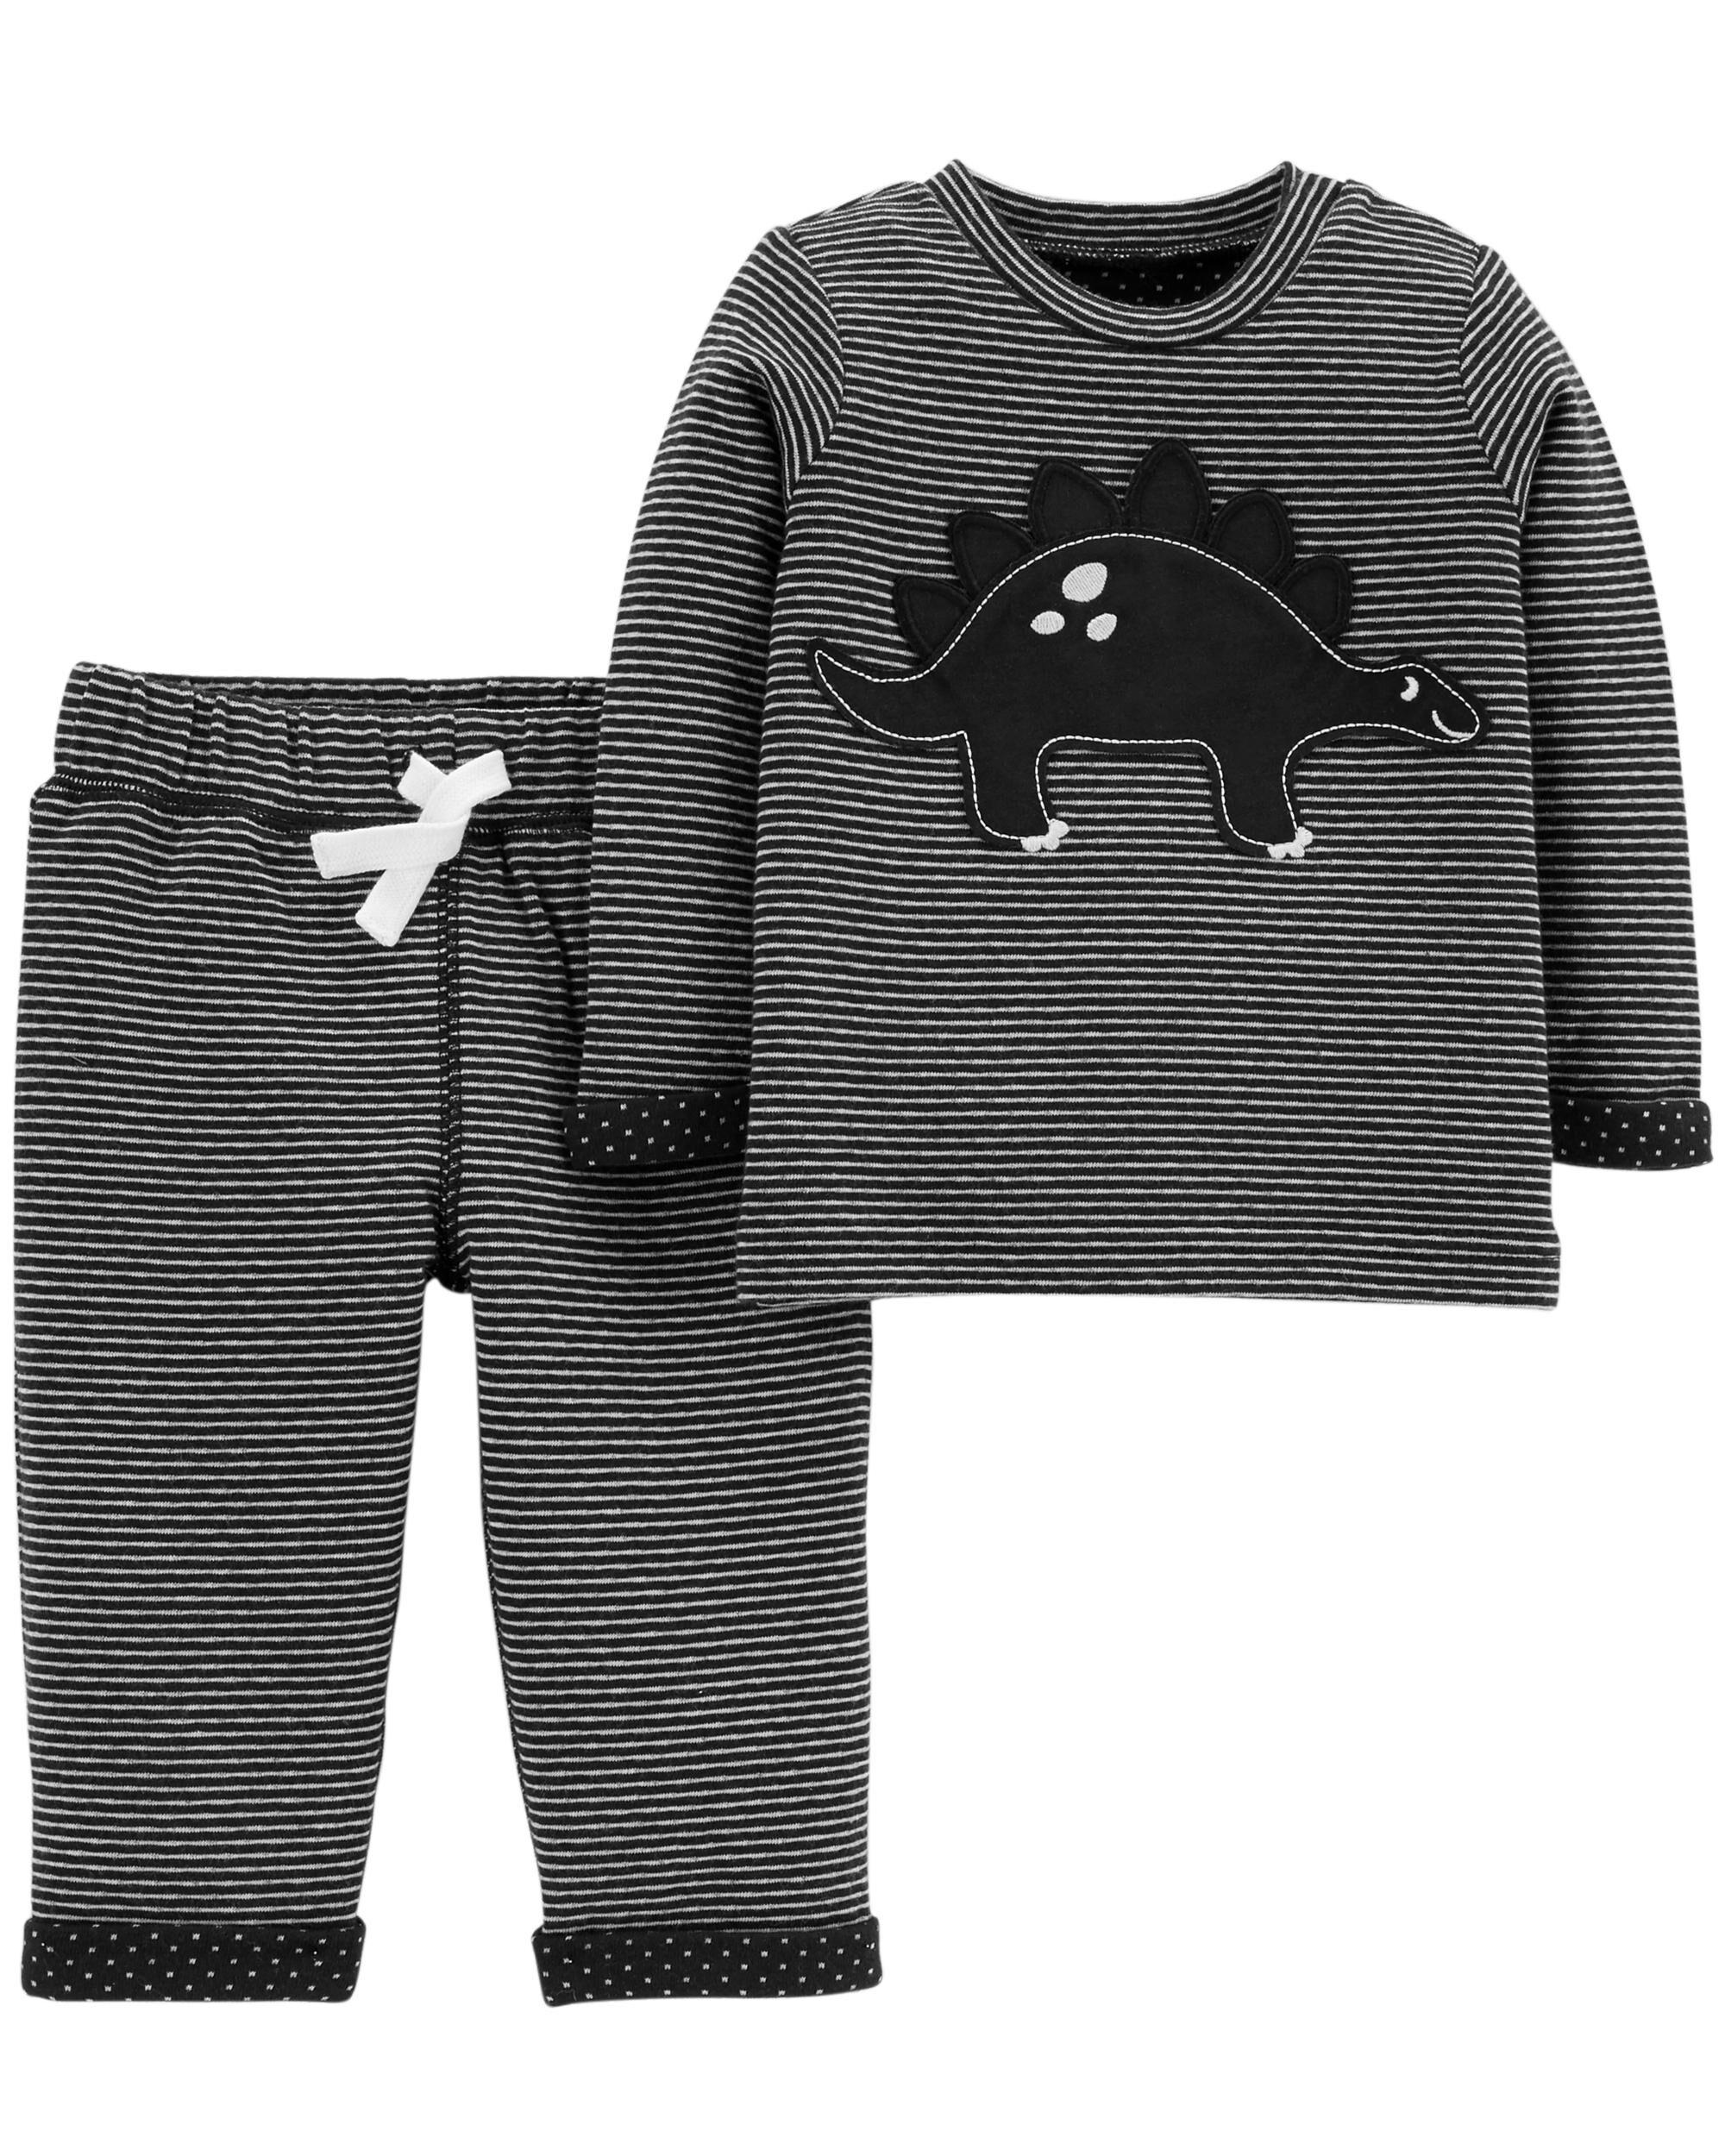 5f00ba691 2-Piece Dinosaur Top & Reversible Pant Set. Loading zoom